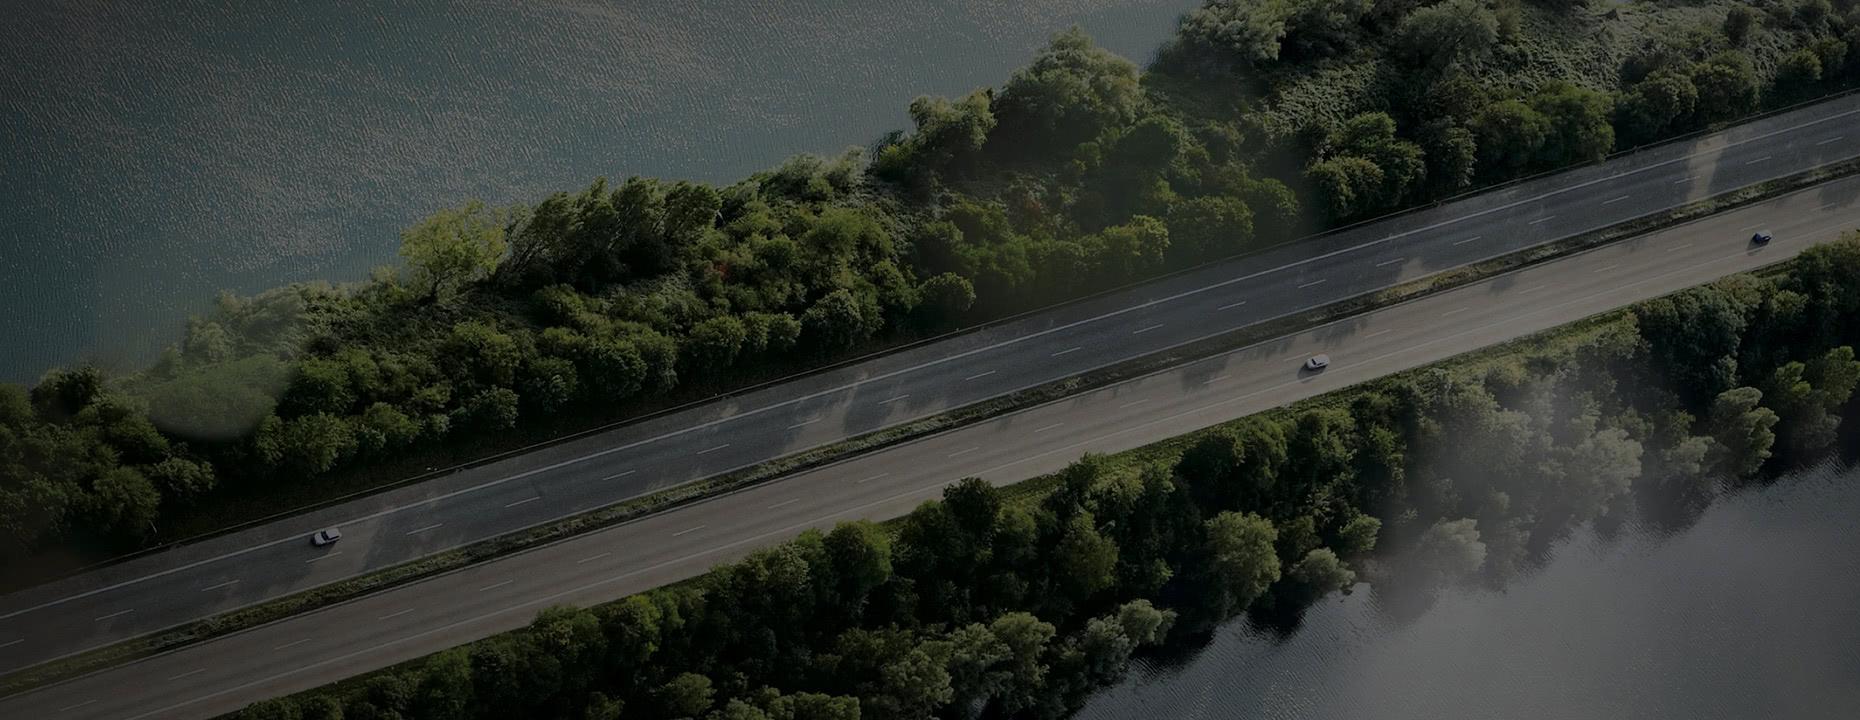 New Hyundai Accent - за привабливими цінами | Богдан-Авто Запорожье - фото 9